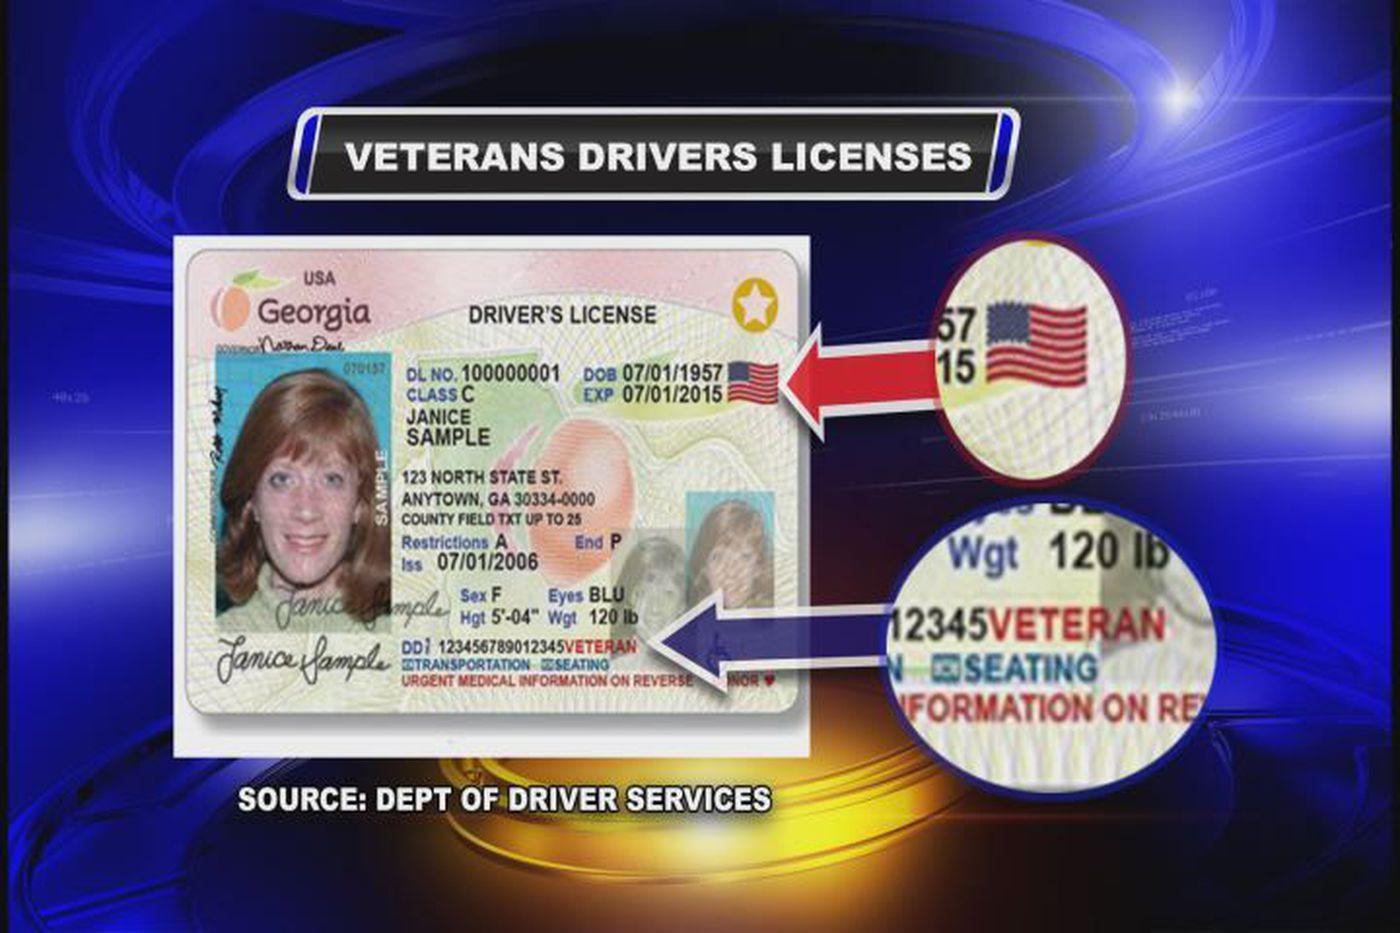 New georgia drivers license image — 2